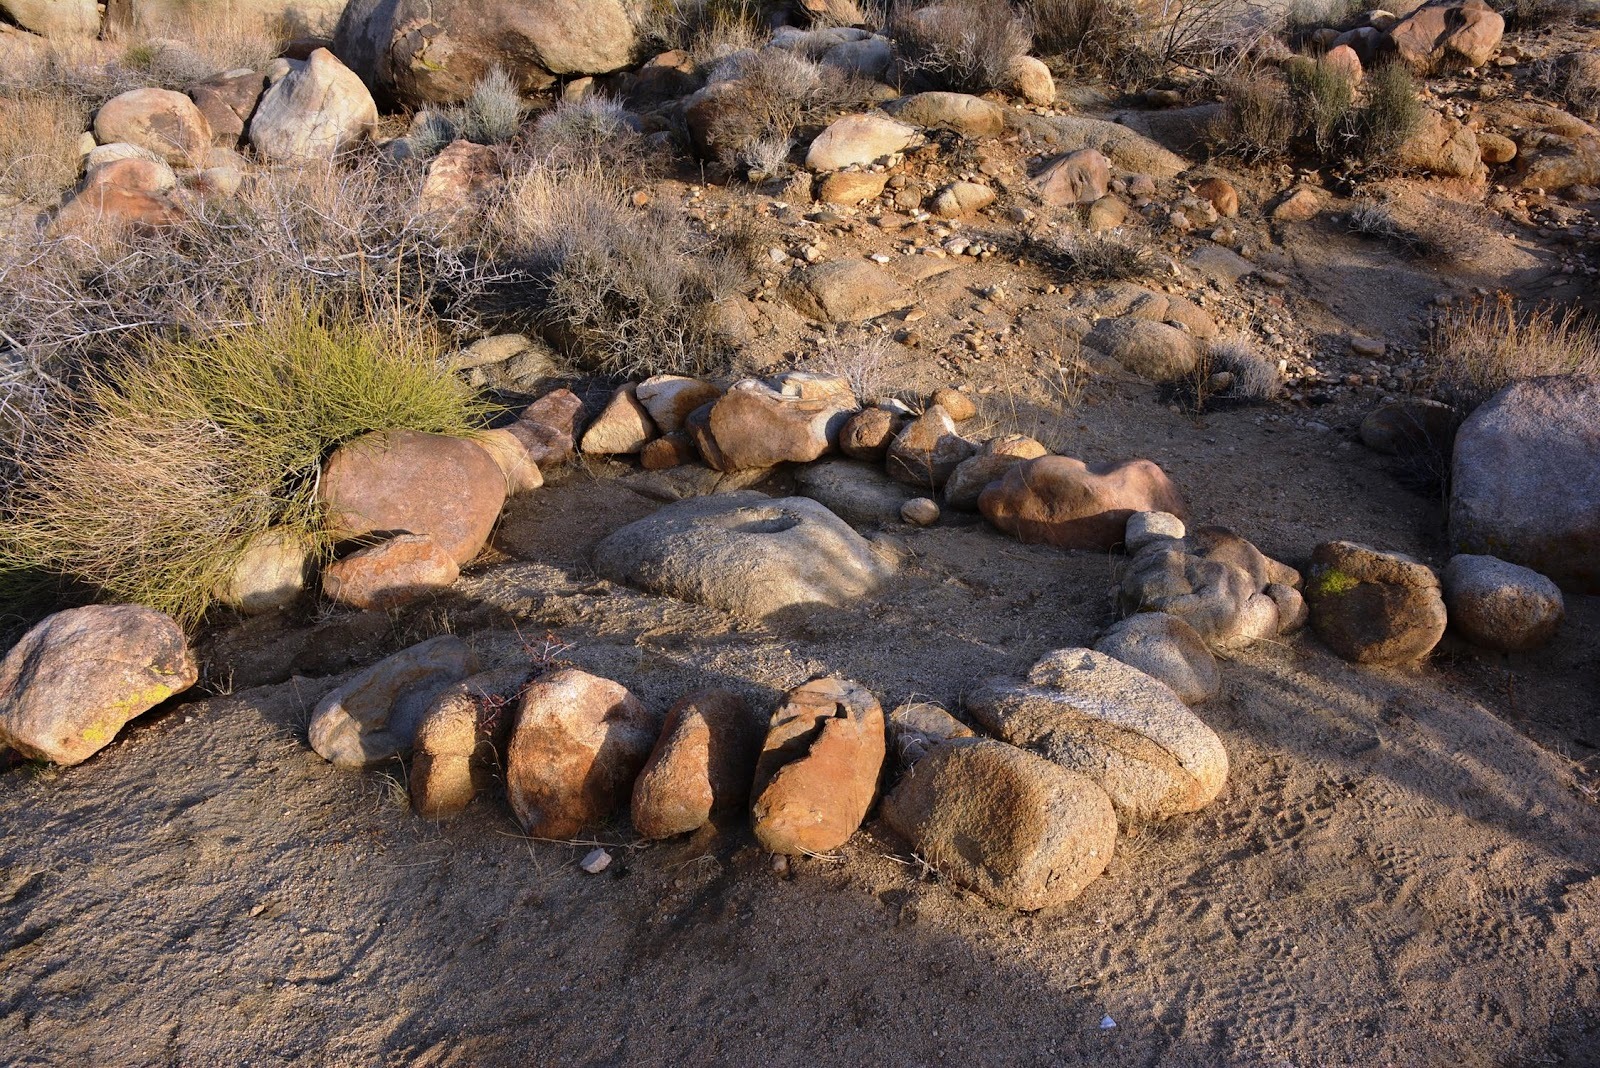 Patrick Tillett Coyote Hole Rock Art 1 The GOOD Joshua Tree